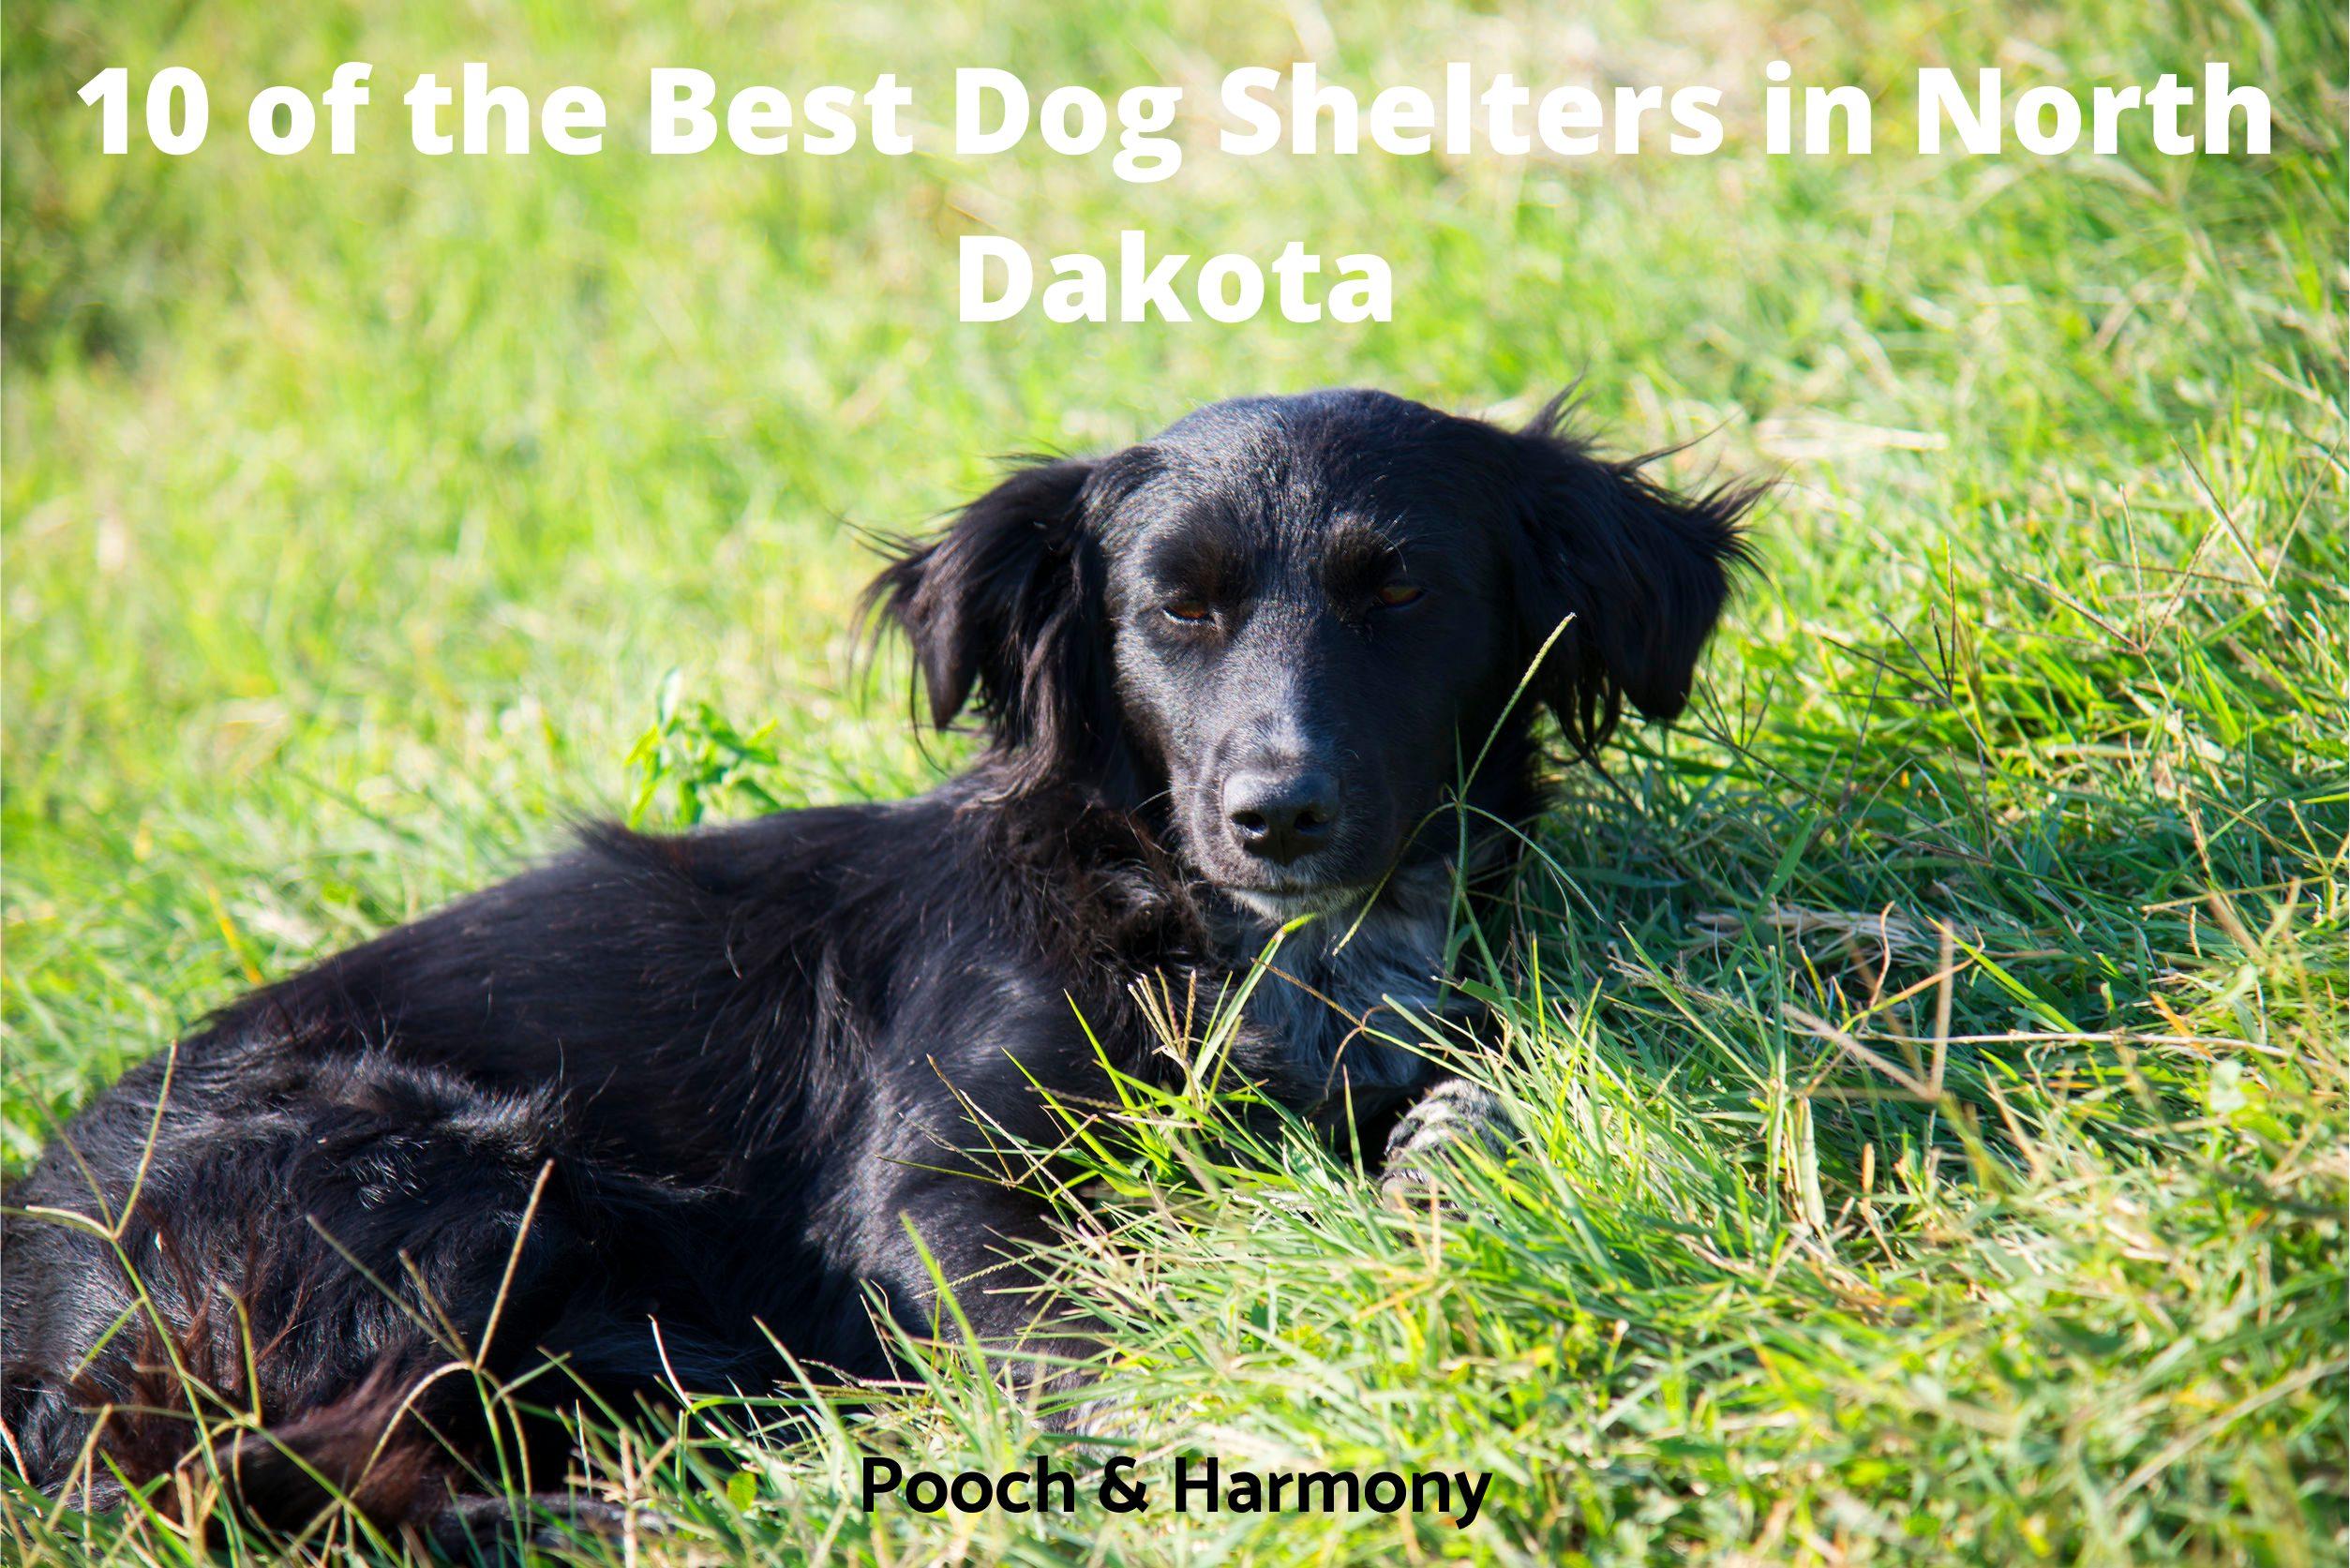 Best Dog Shelters in North Dakota